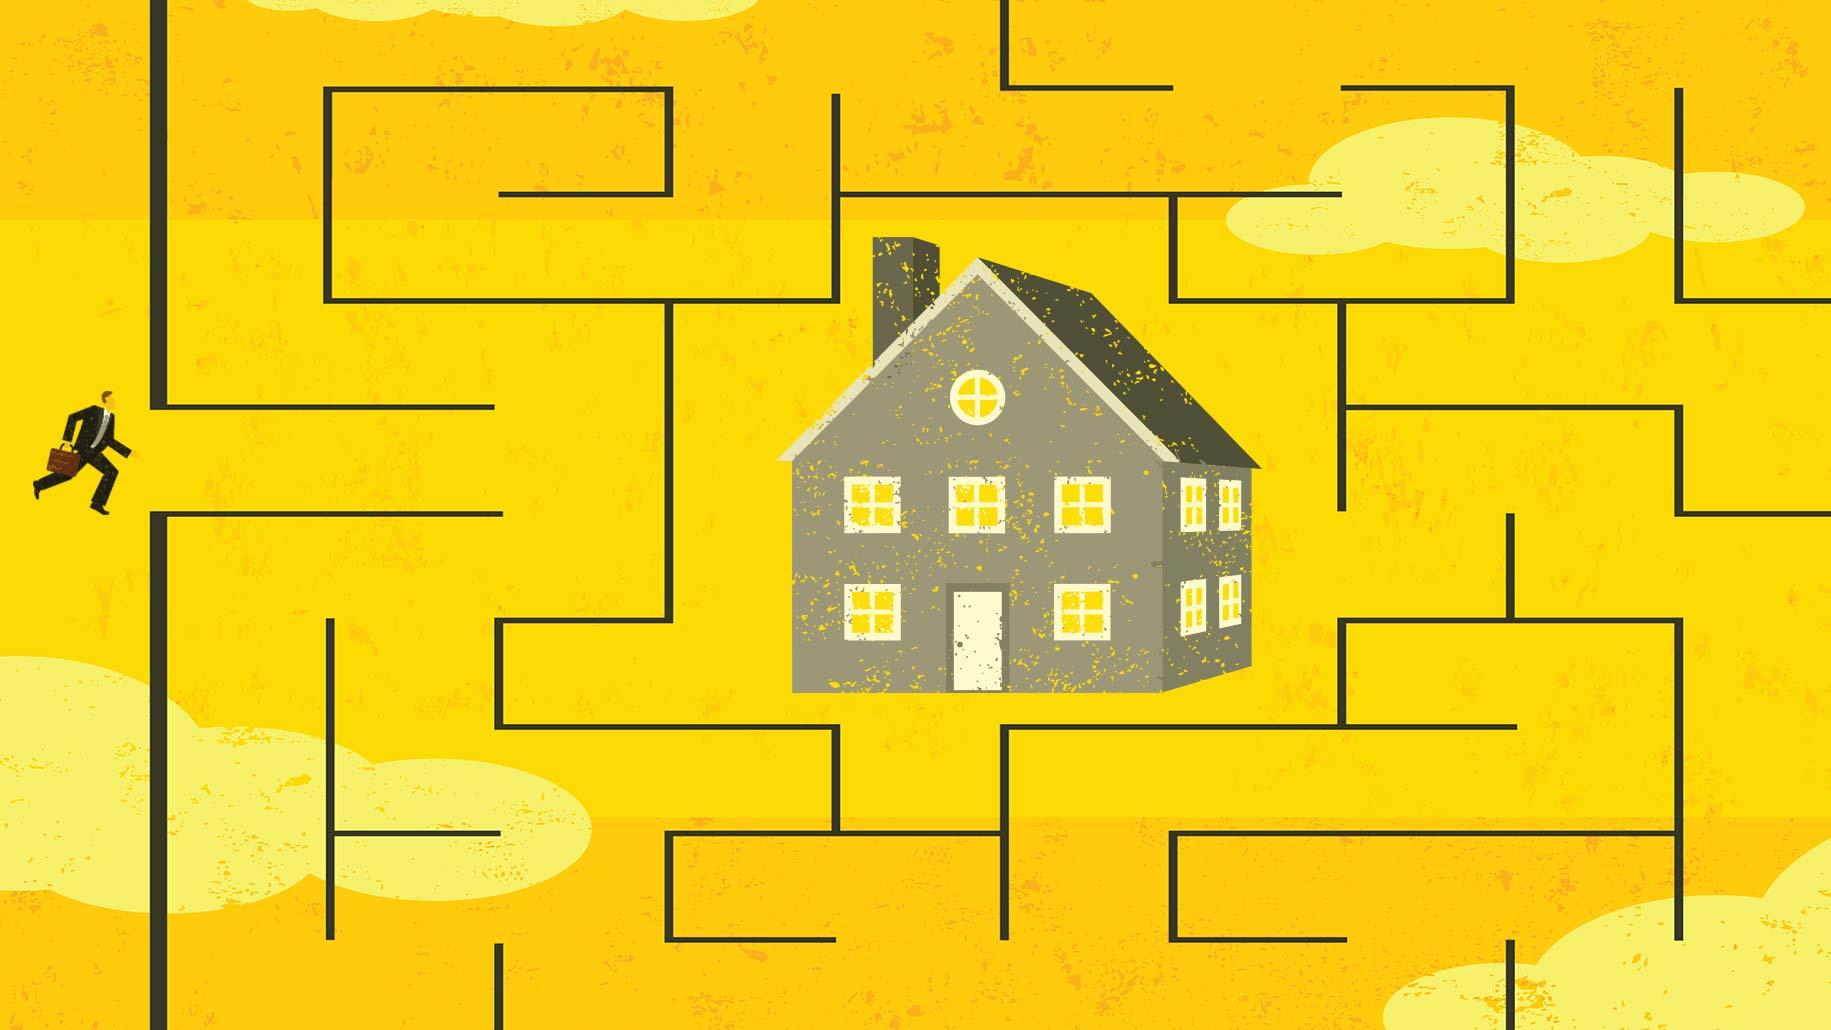 house-in-maze.jpg